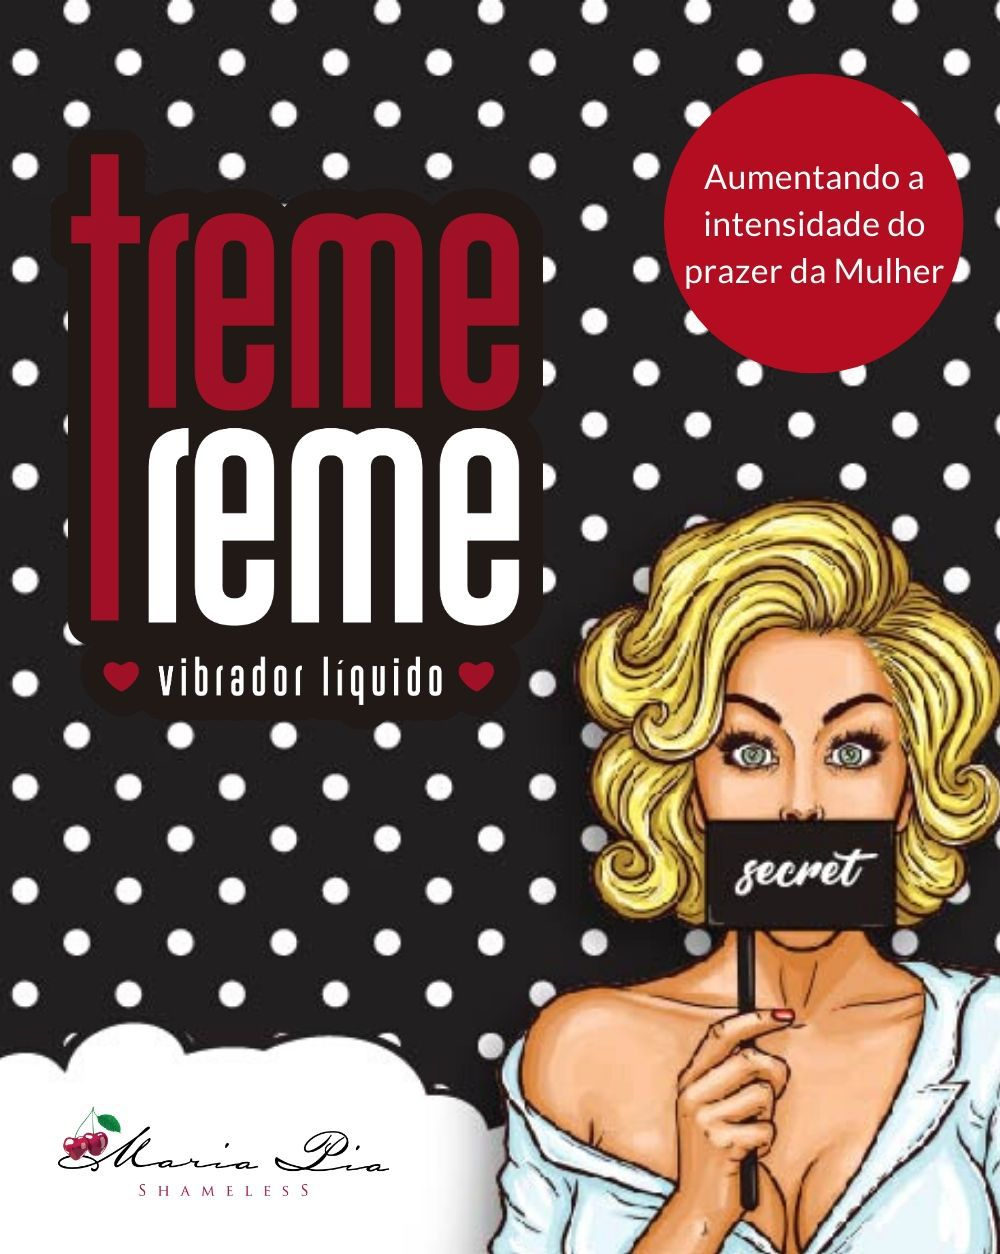 TREME TREME (ref: 9722)